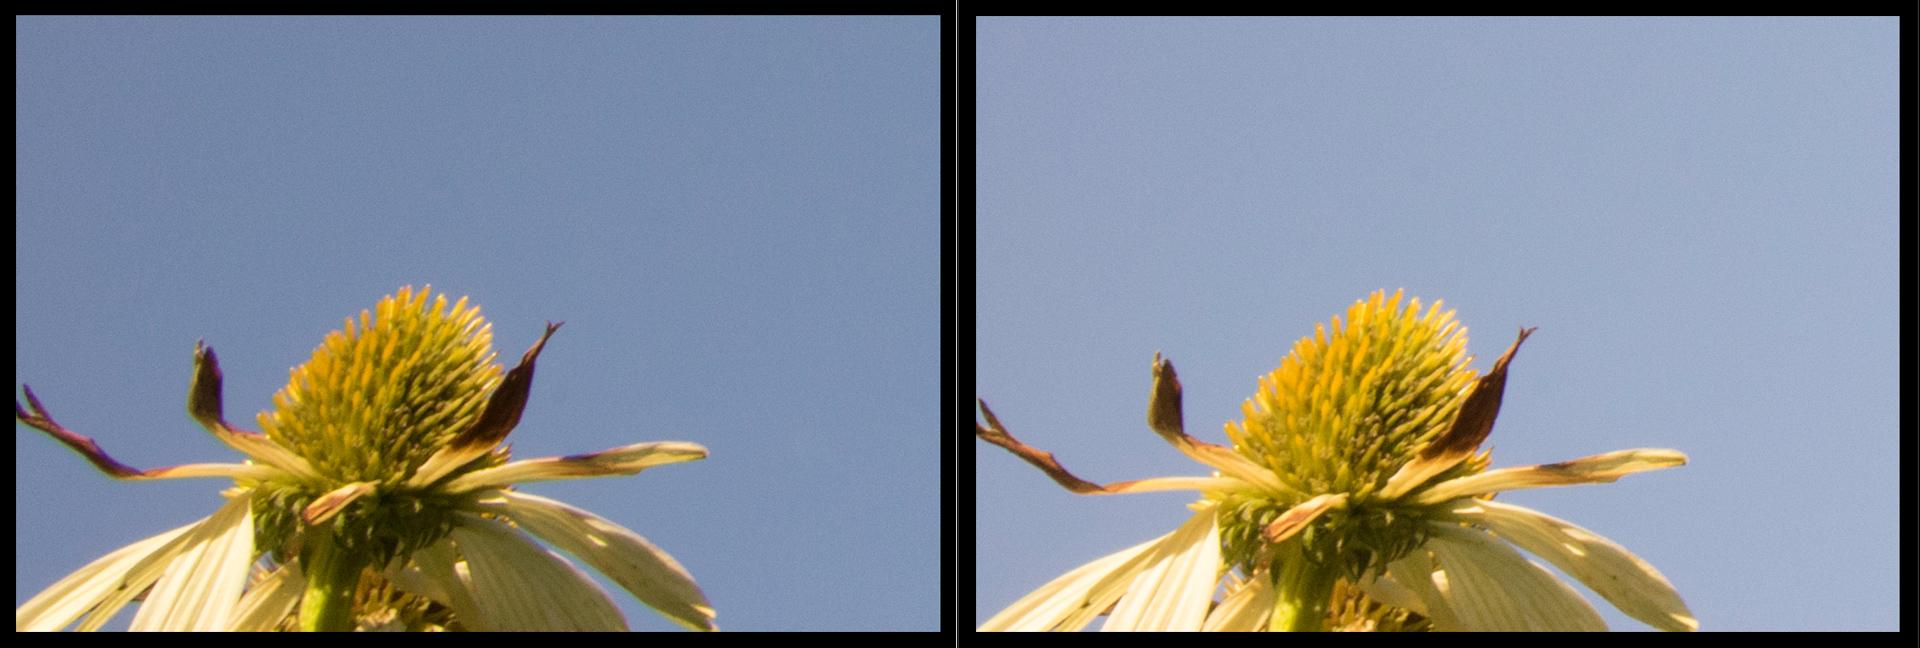 Canon 17-40mm F4 vs Canon 16-35mm F4 at 24mm F22 Corner Sharpness